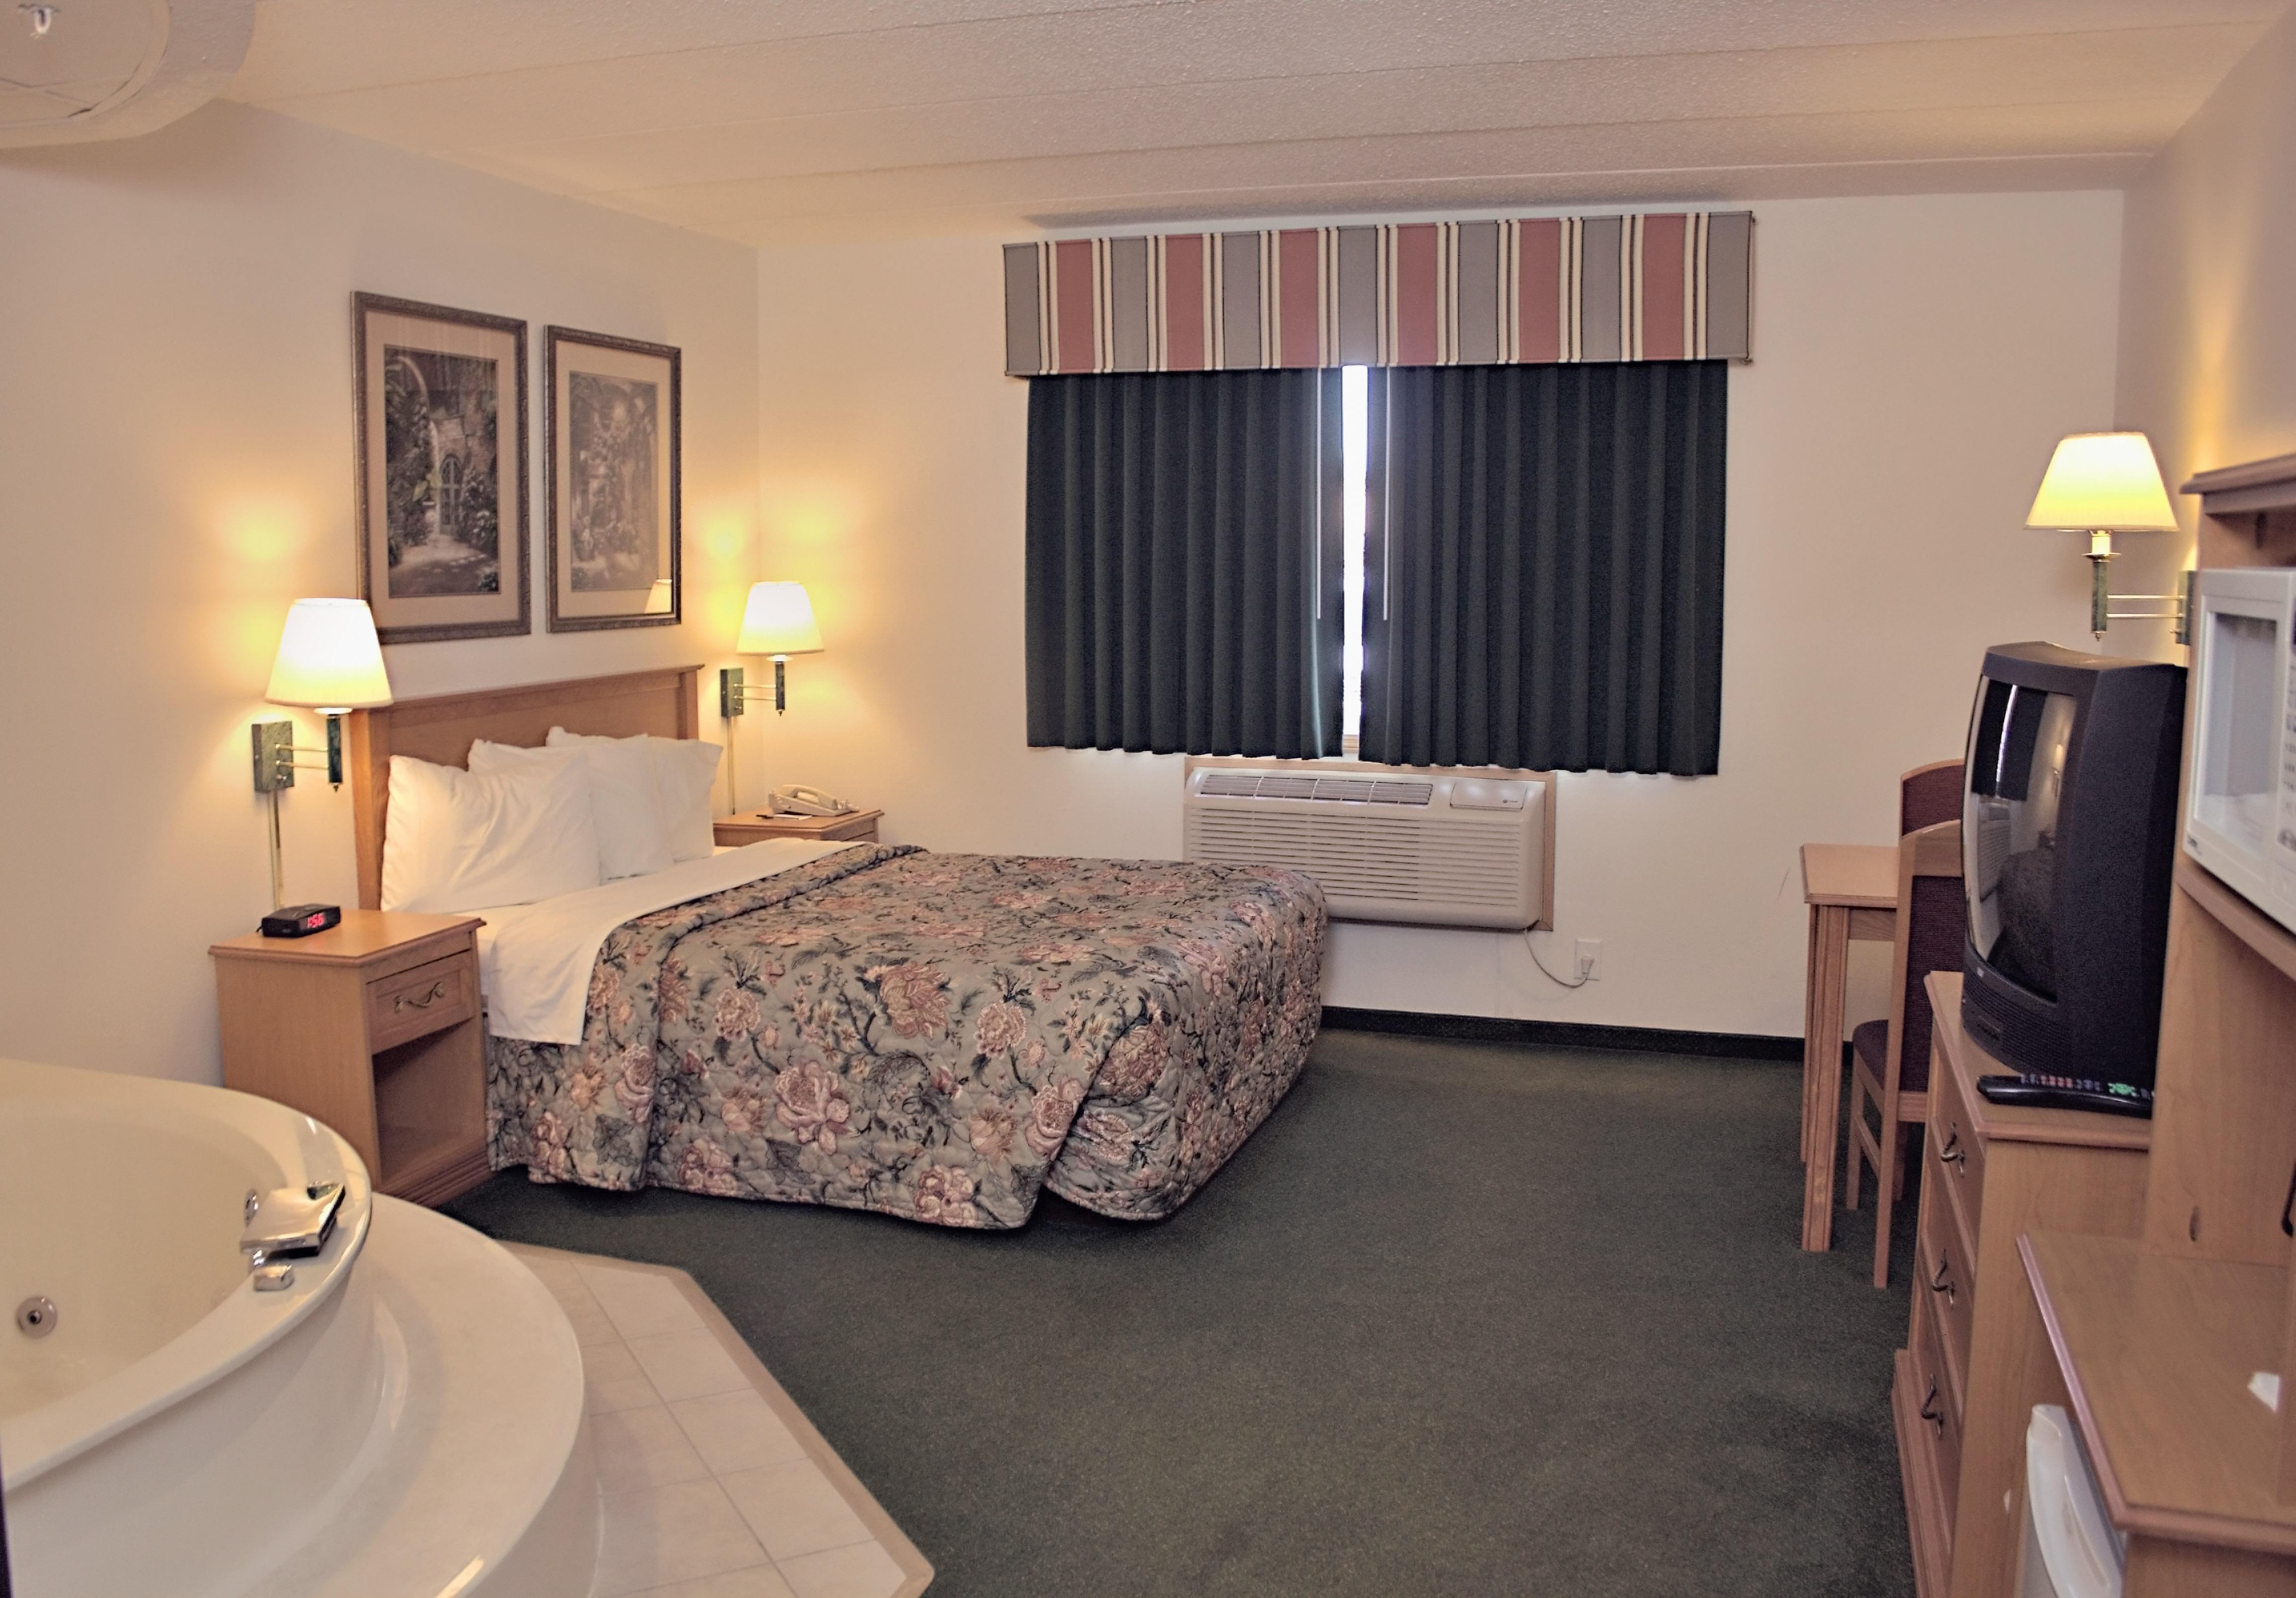 America's Best Inn & Suites, Annandale MN